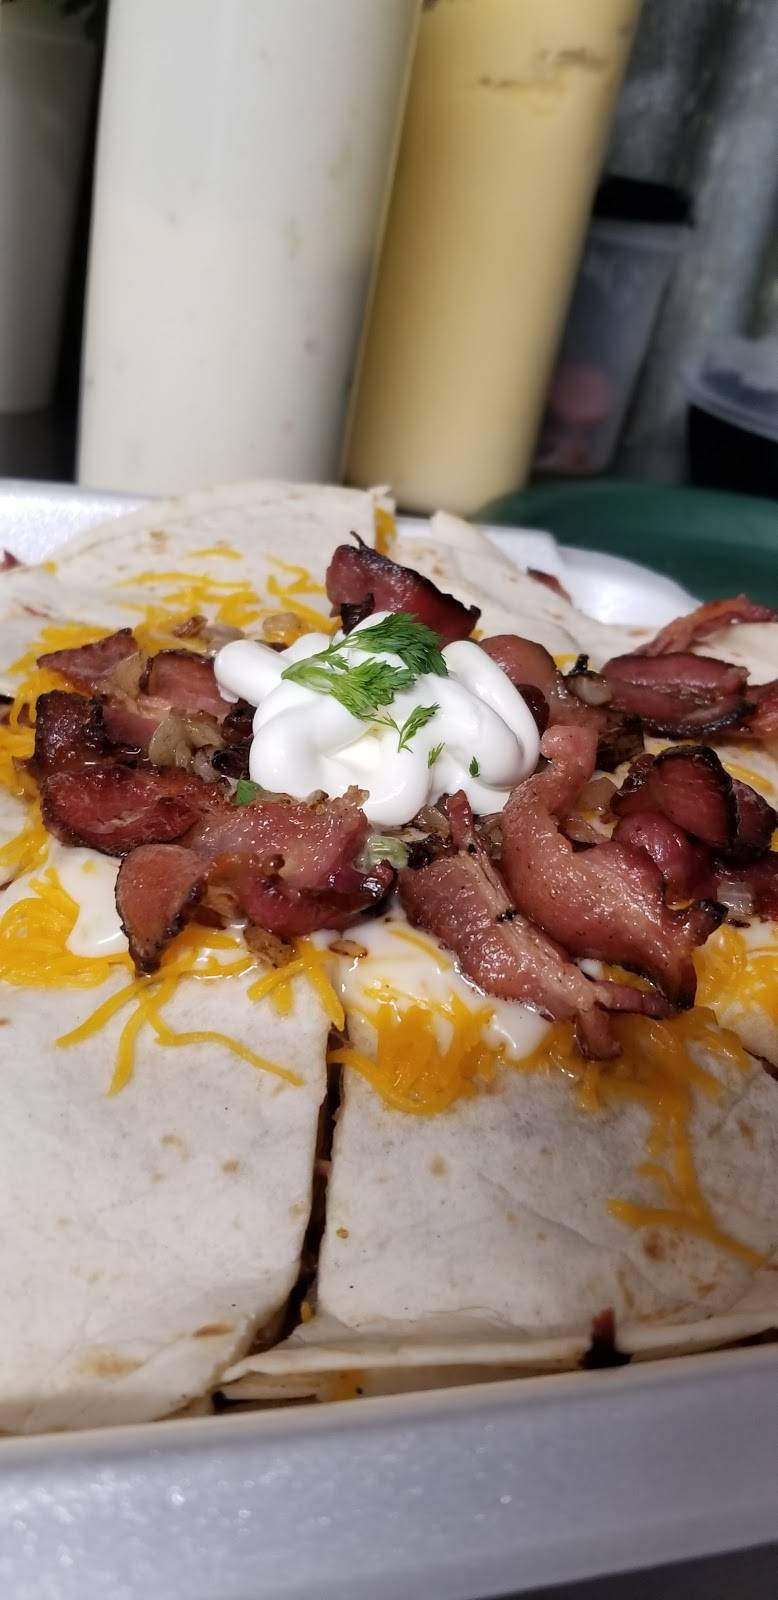 Spirit Bbq | restaurant | 107 Briscoe St, Gorman, TX 76454, USA | 2542430201 OR +1 254-243-0201